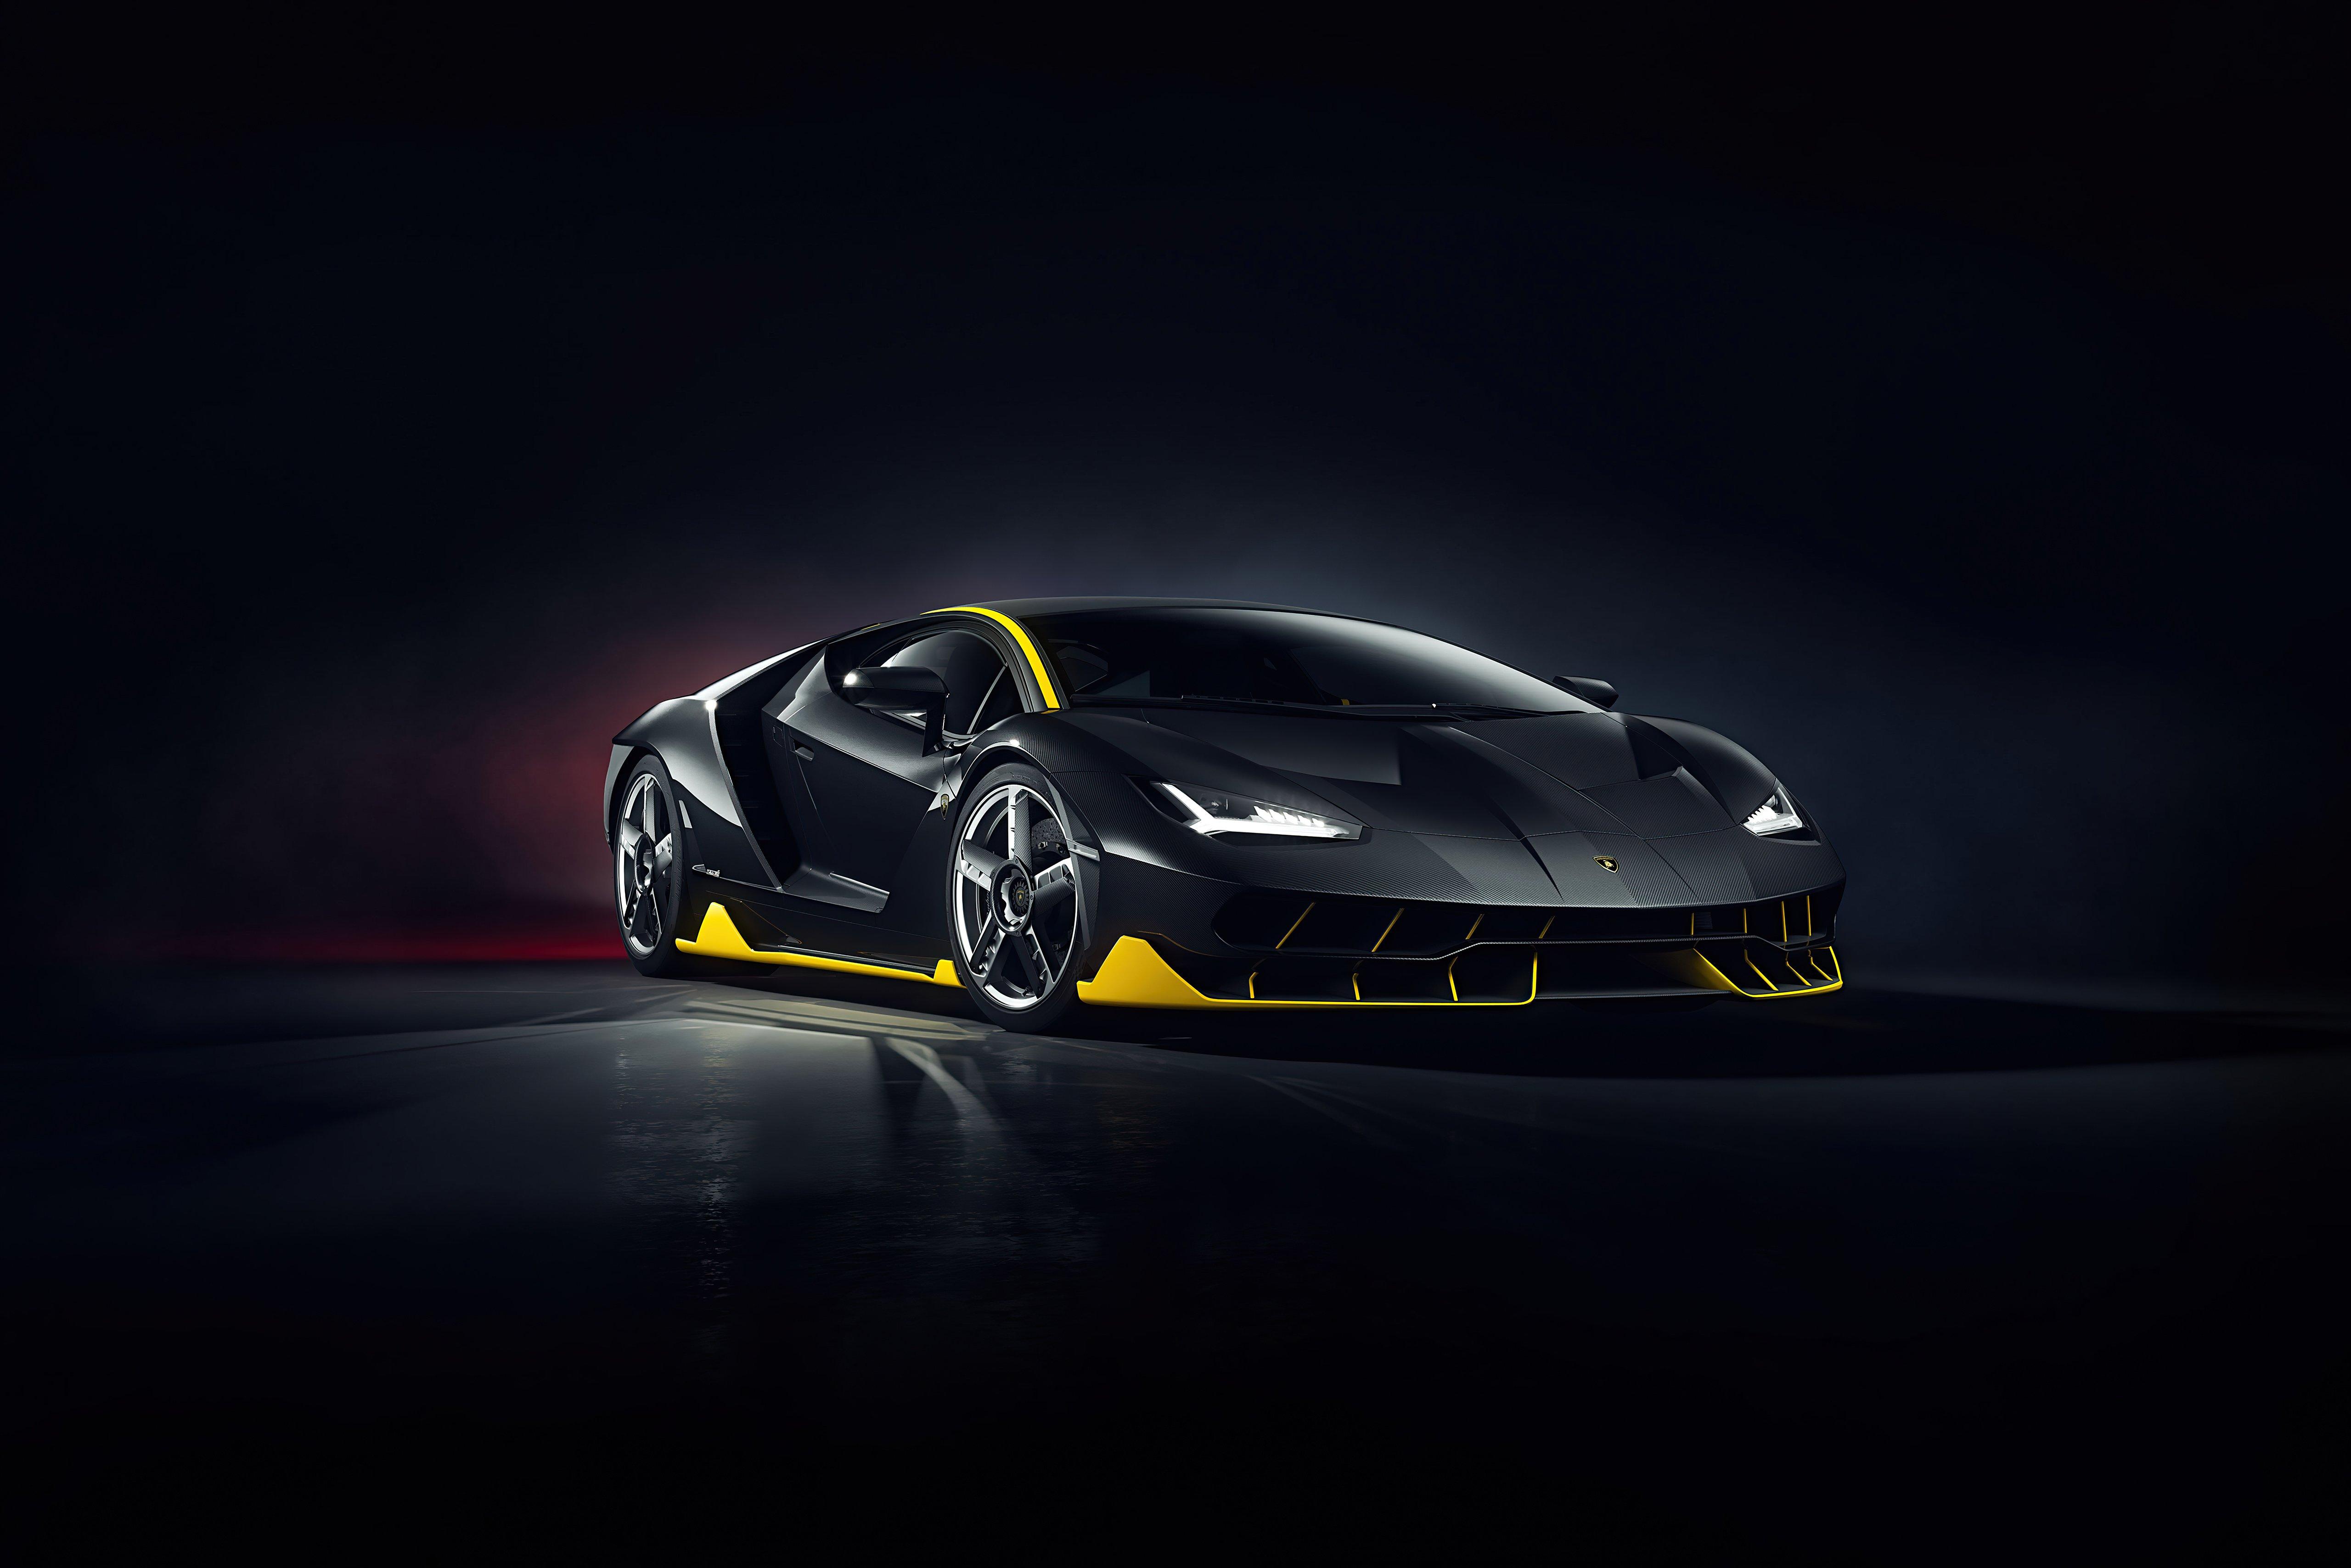 Wallpaper Lamborghini Centenario CGI